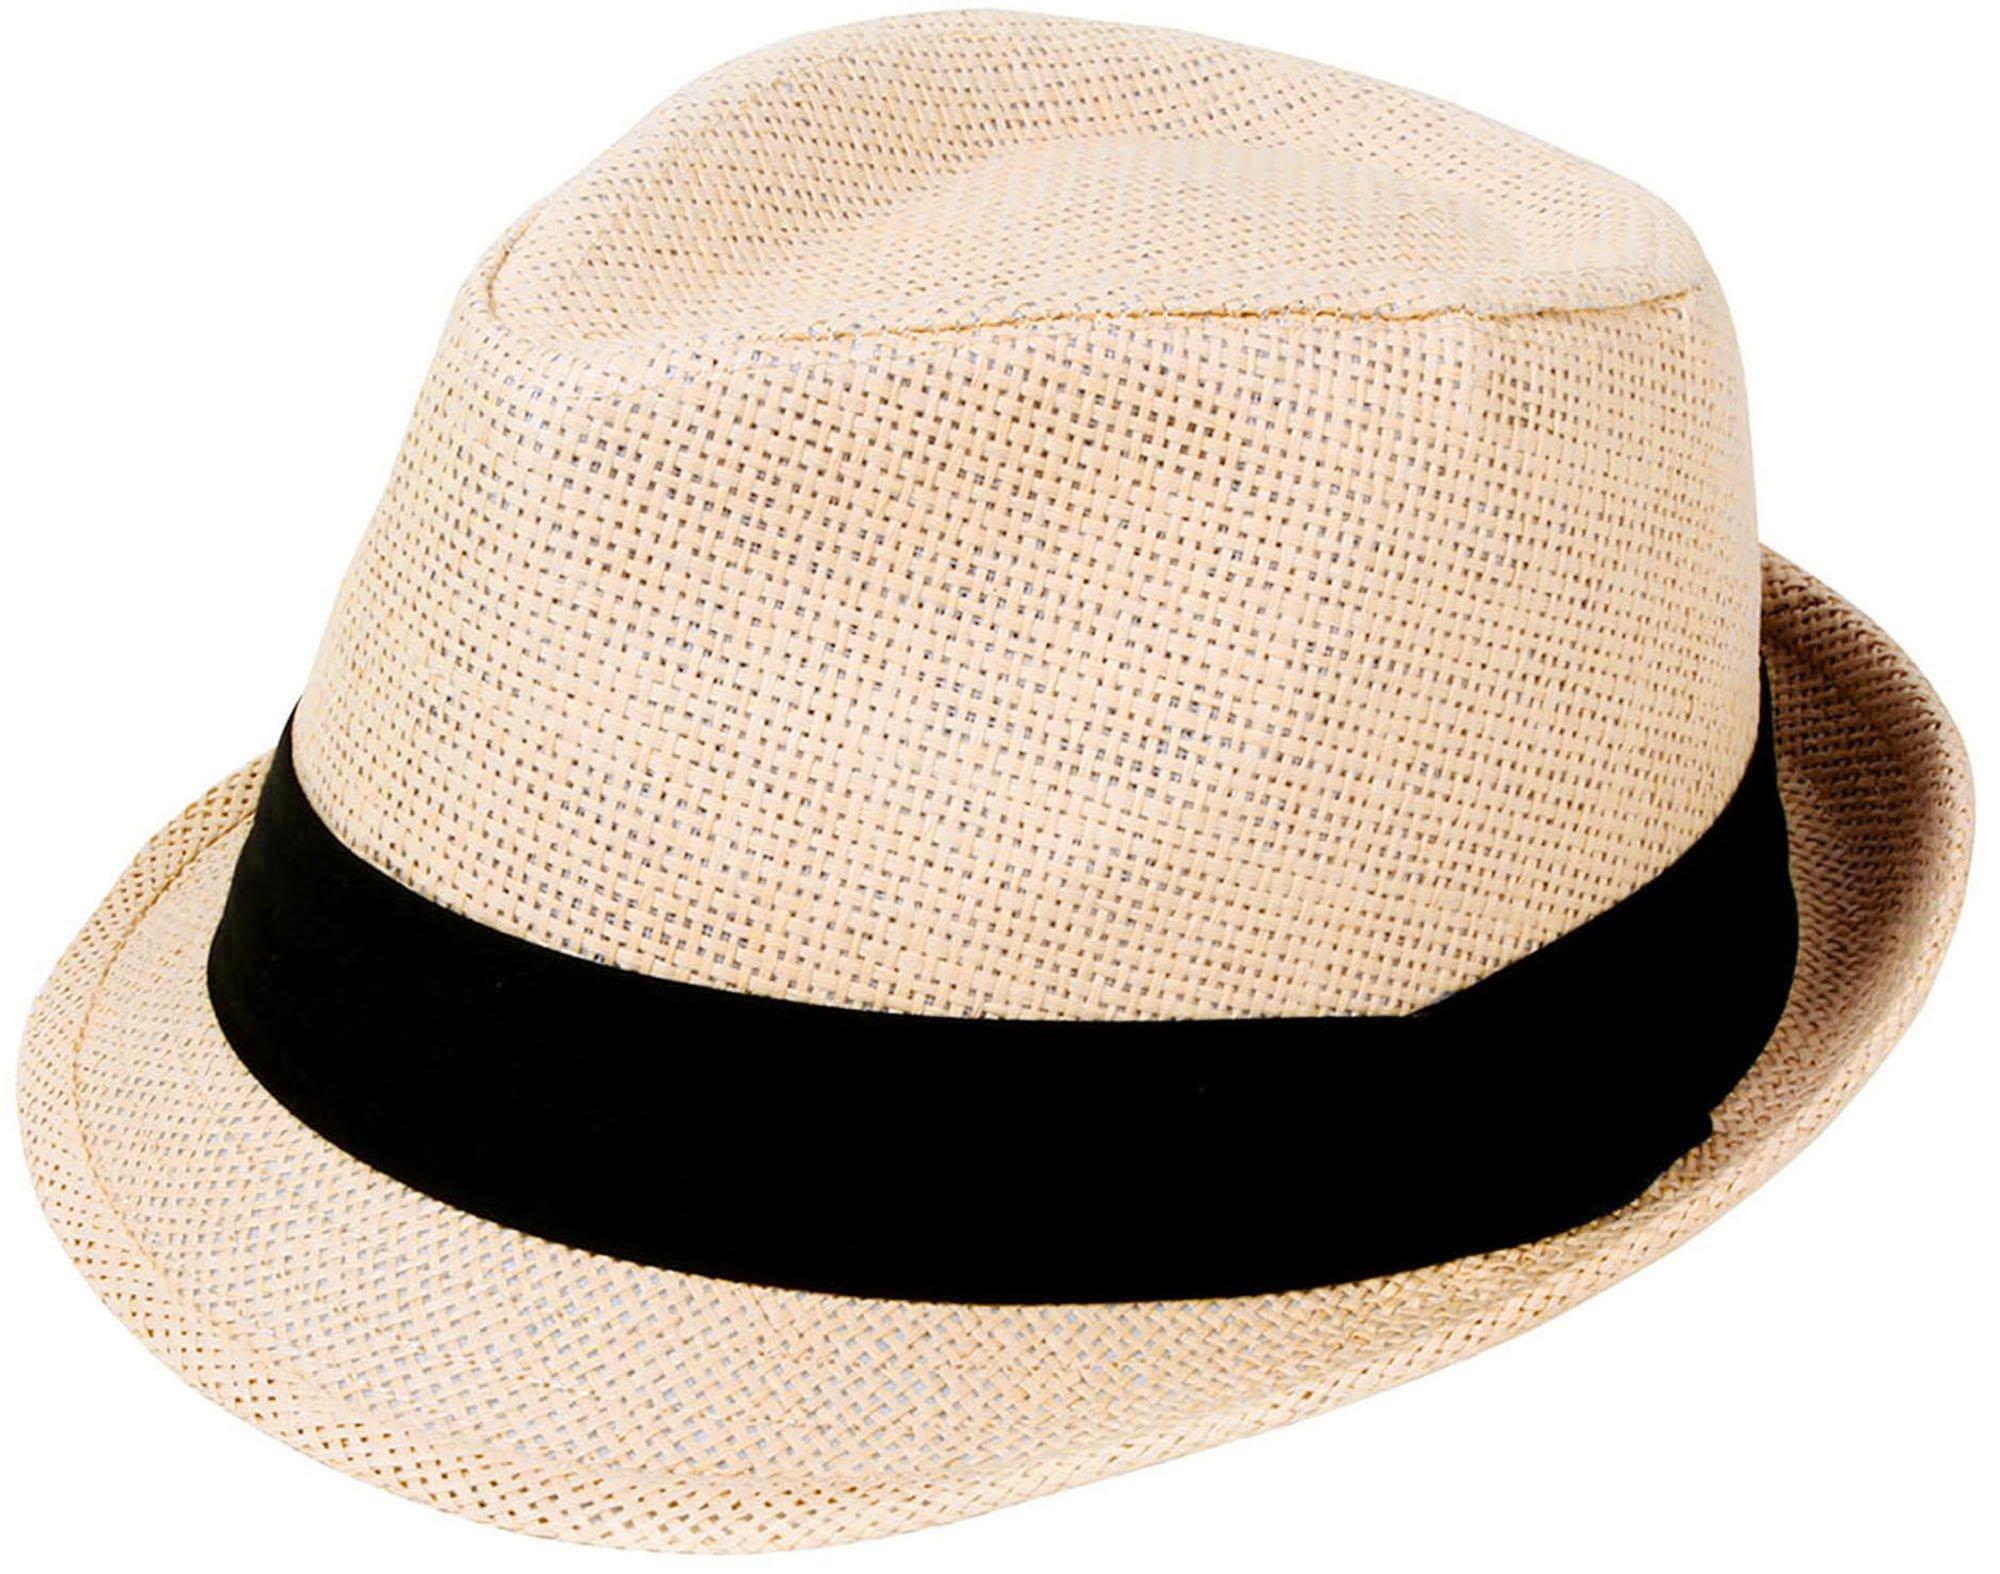 Simplicity Summer Sun Short Brim Straw Fedora Hat, 756_Natural LXL